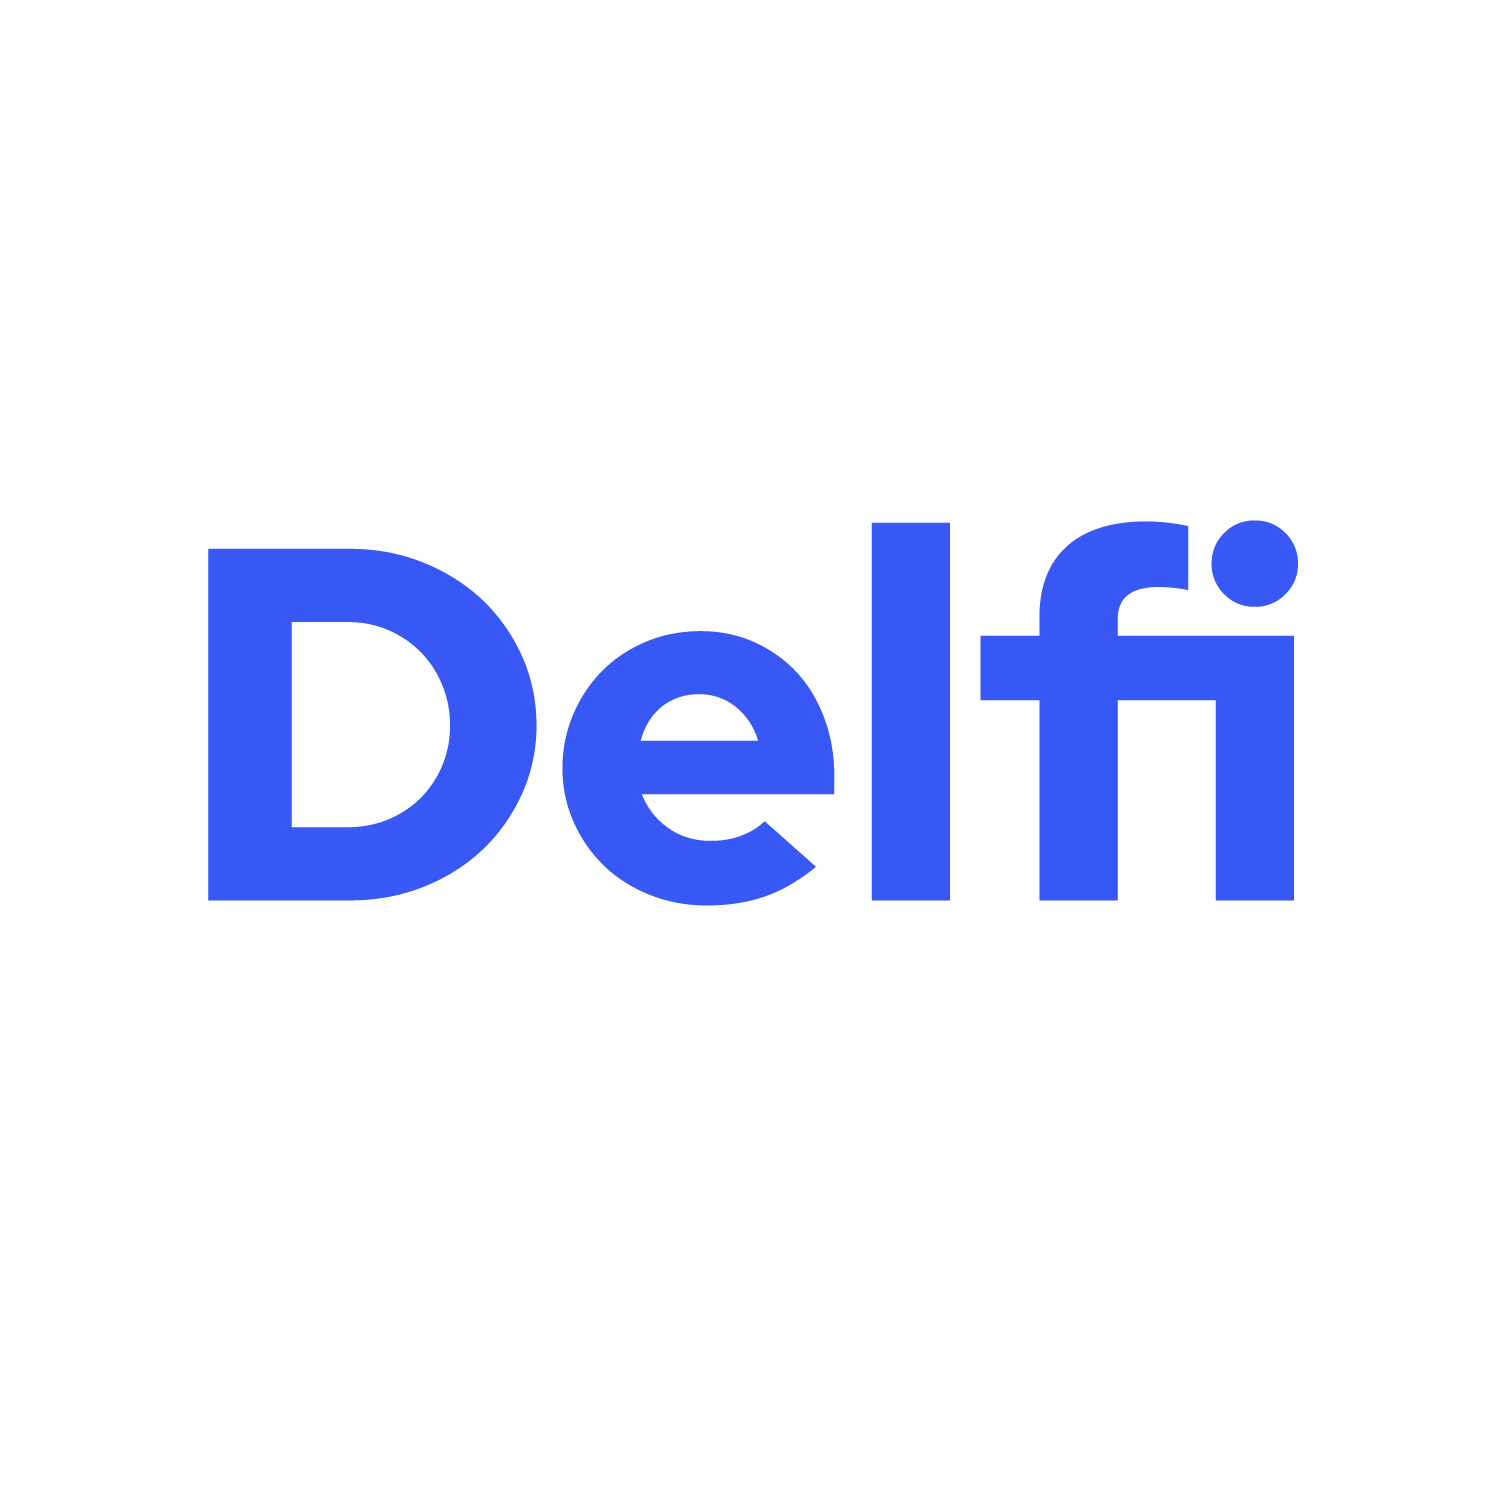 DELFI Melo Detektorius